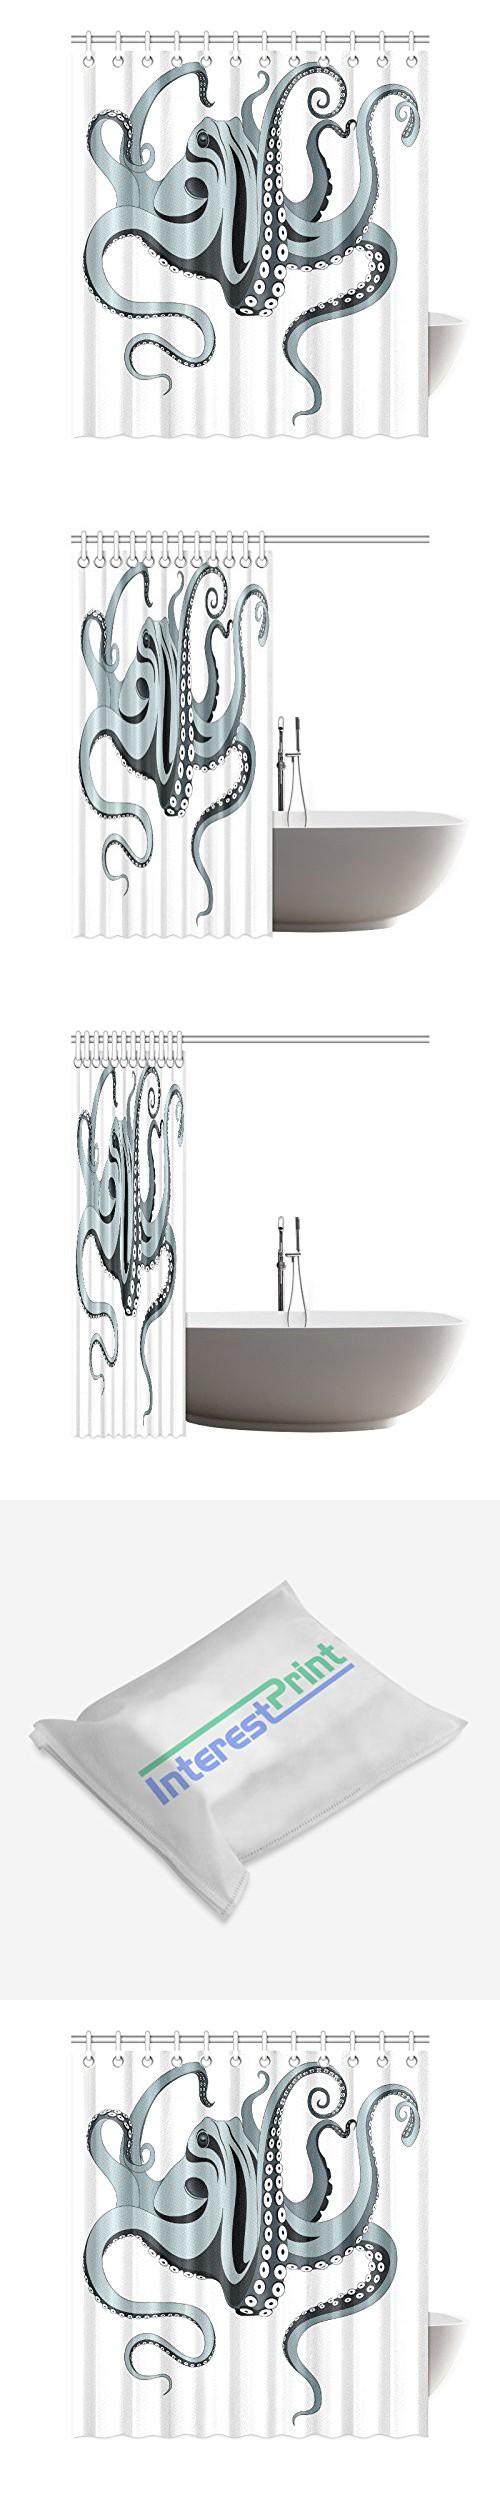 Bathroom sink drawing - Interestprint Home Bathroom Decor Funny Art Hipster Octopus Shower Curtain Hooks 66x72 Inch Black White